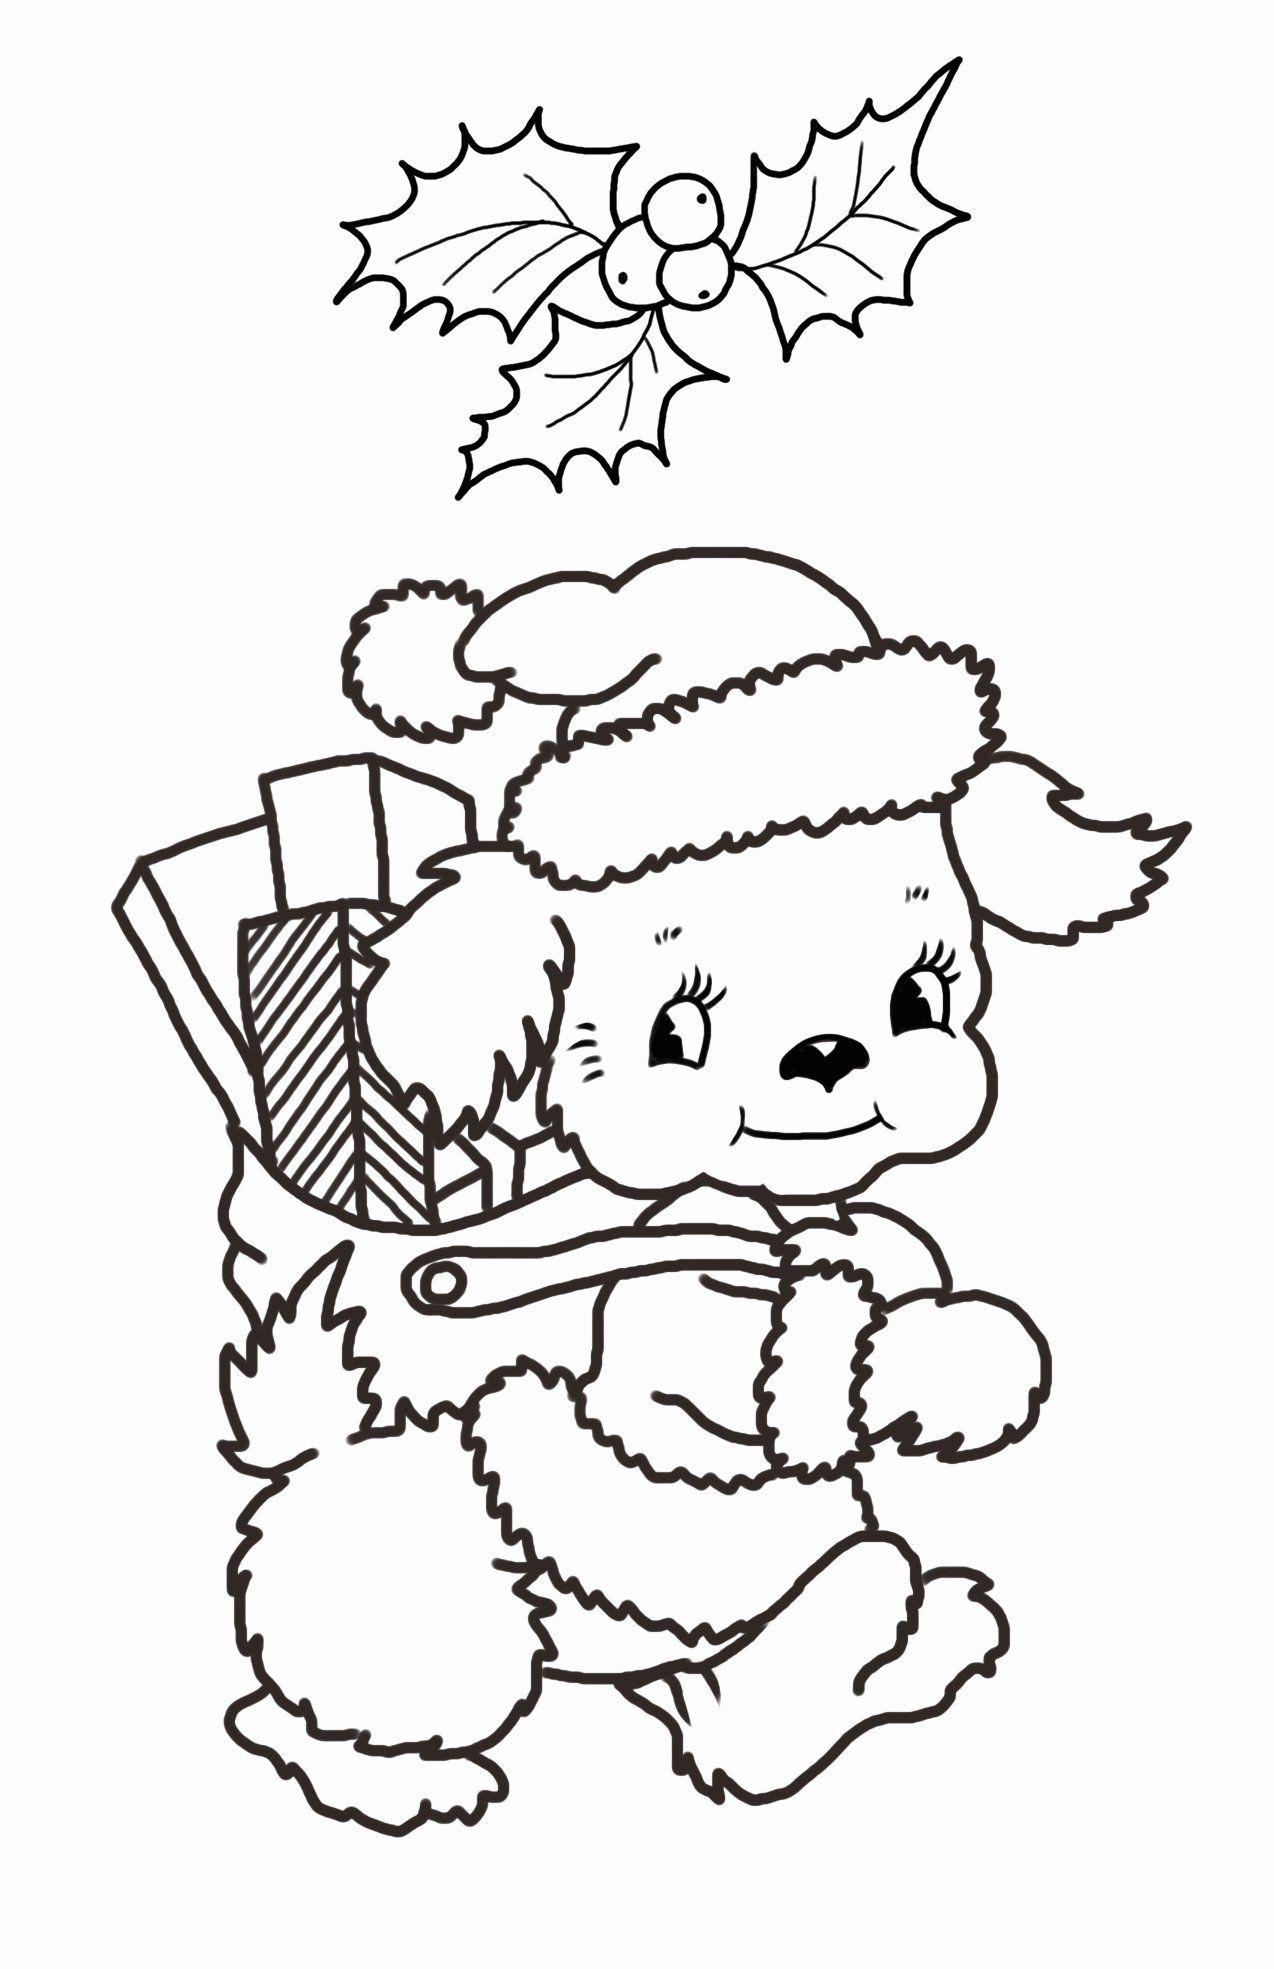 Christmas Puppy Coloring Sheet Fresh Christmas Coloring Pages Christmas Coloring Sheets Christmas Coloring Pages Santa Coloring Pages